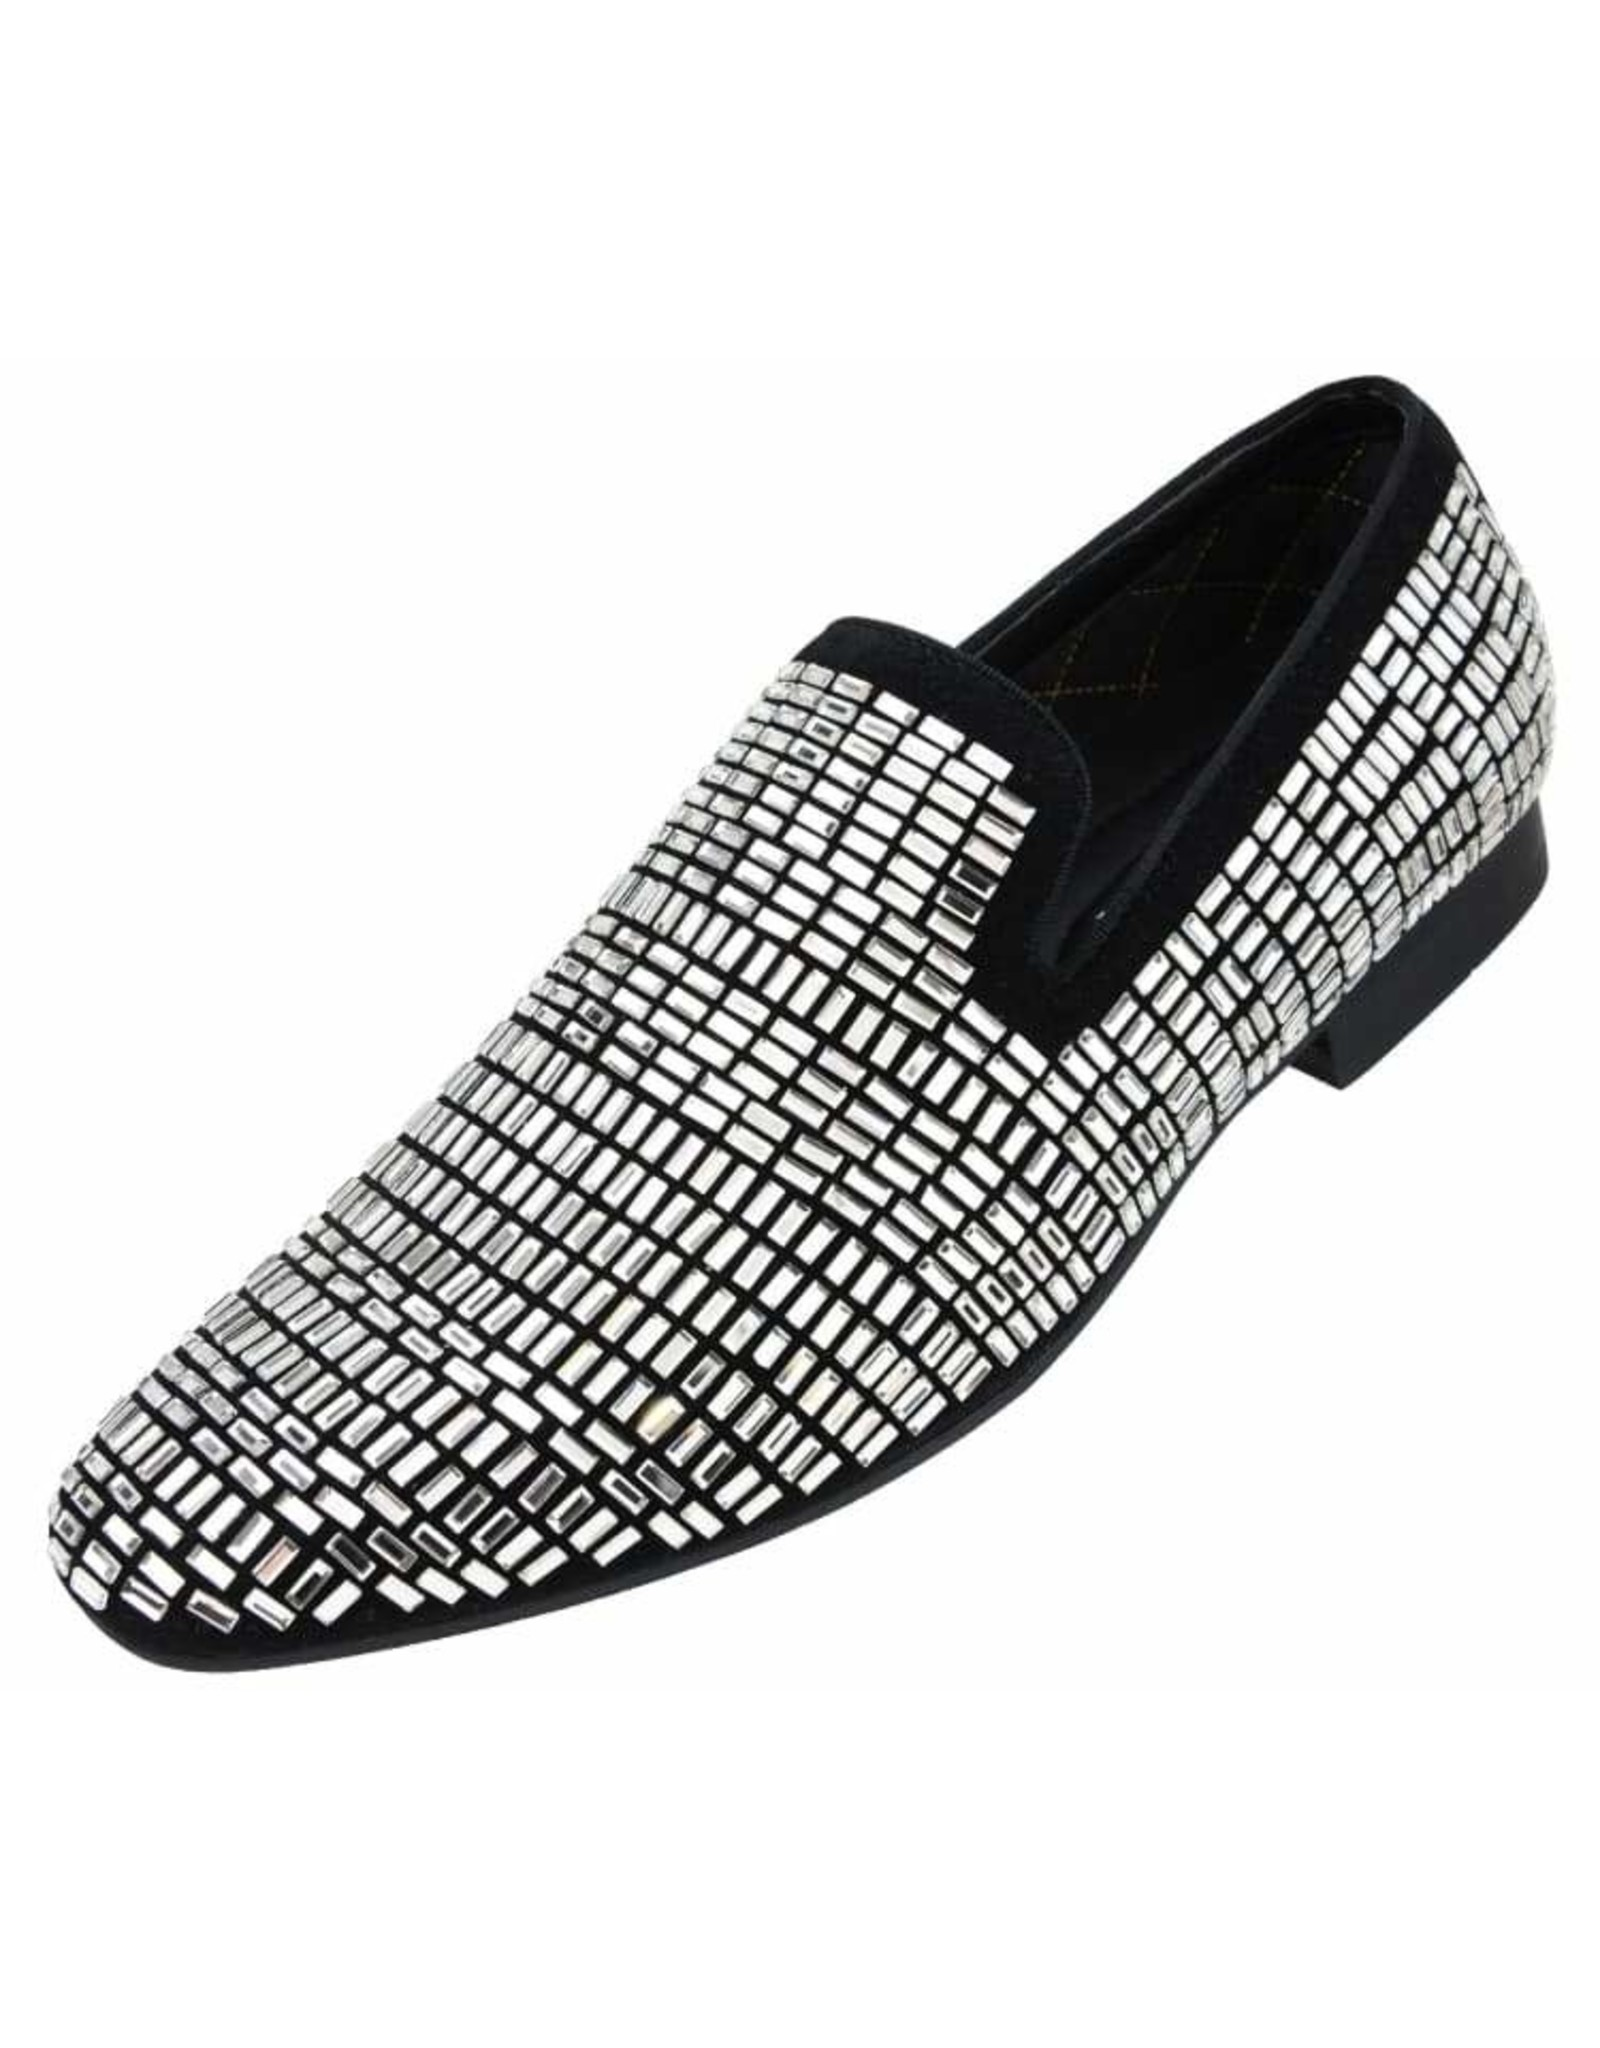 Amali Amali Trimble Formal Shoe - Black/Silver